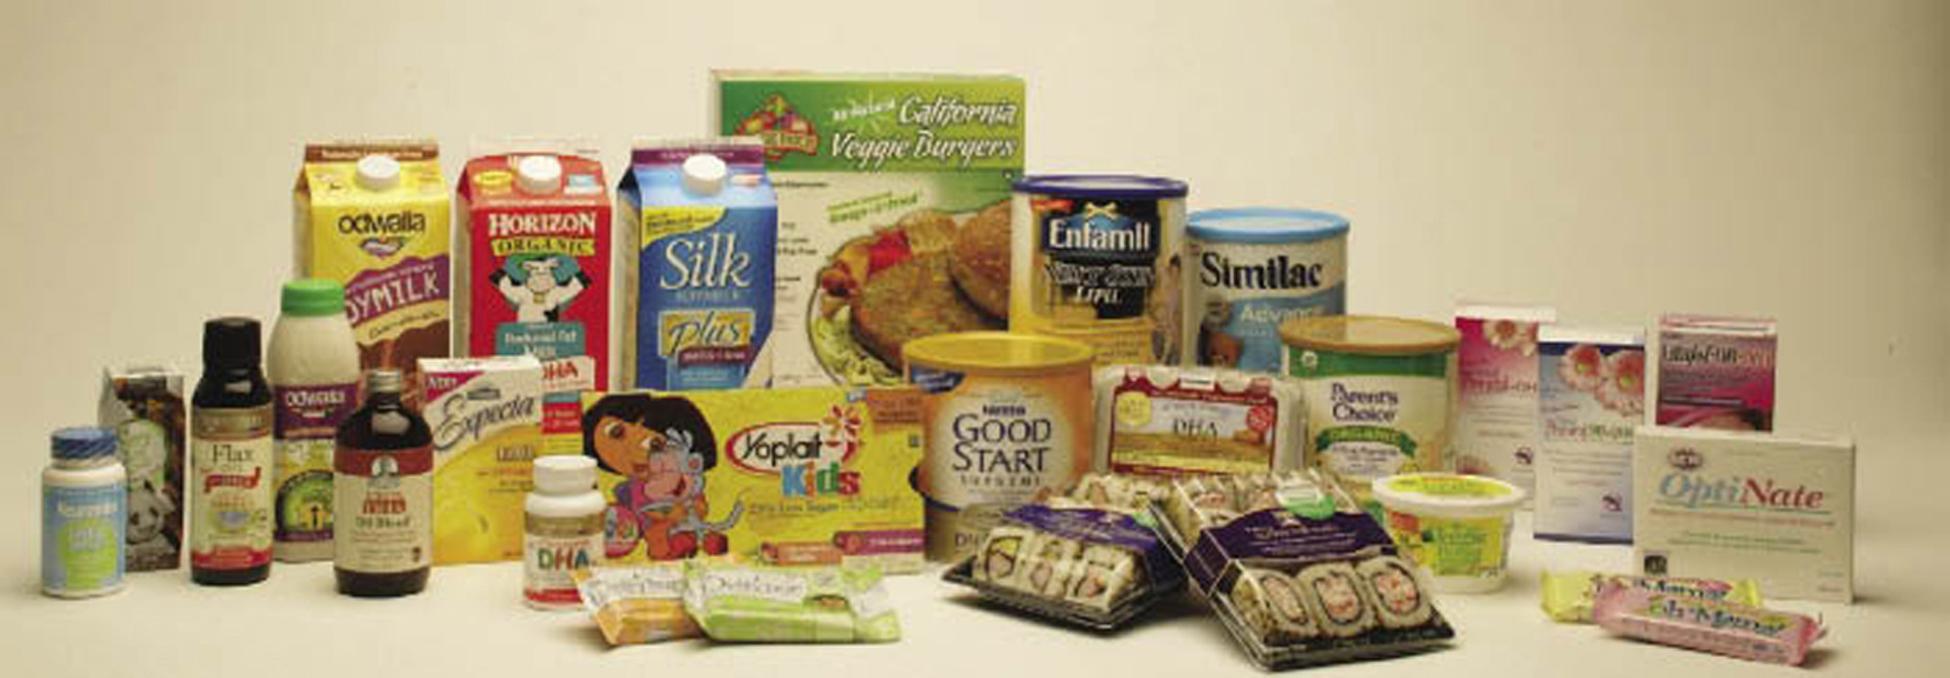 Food products containing arachidonic acid (ARA)